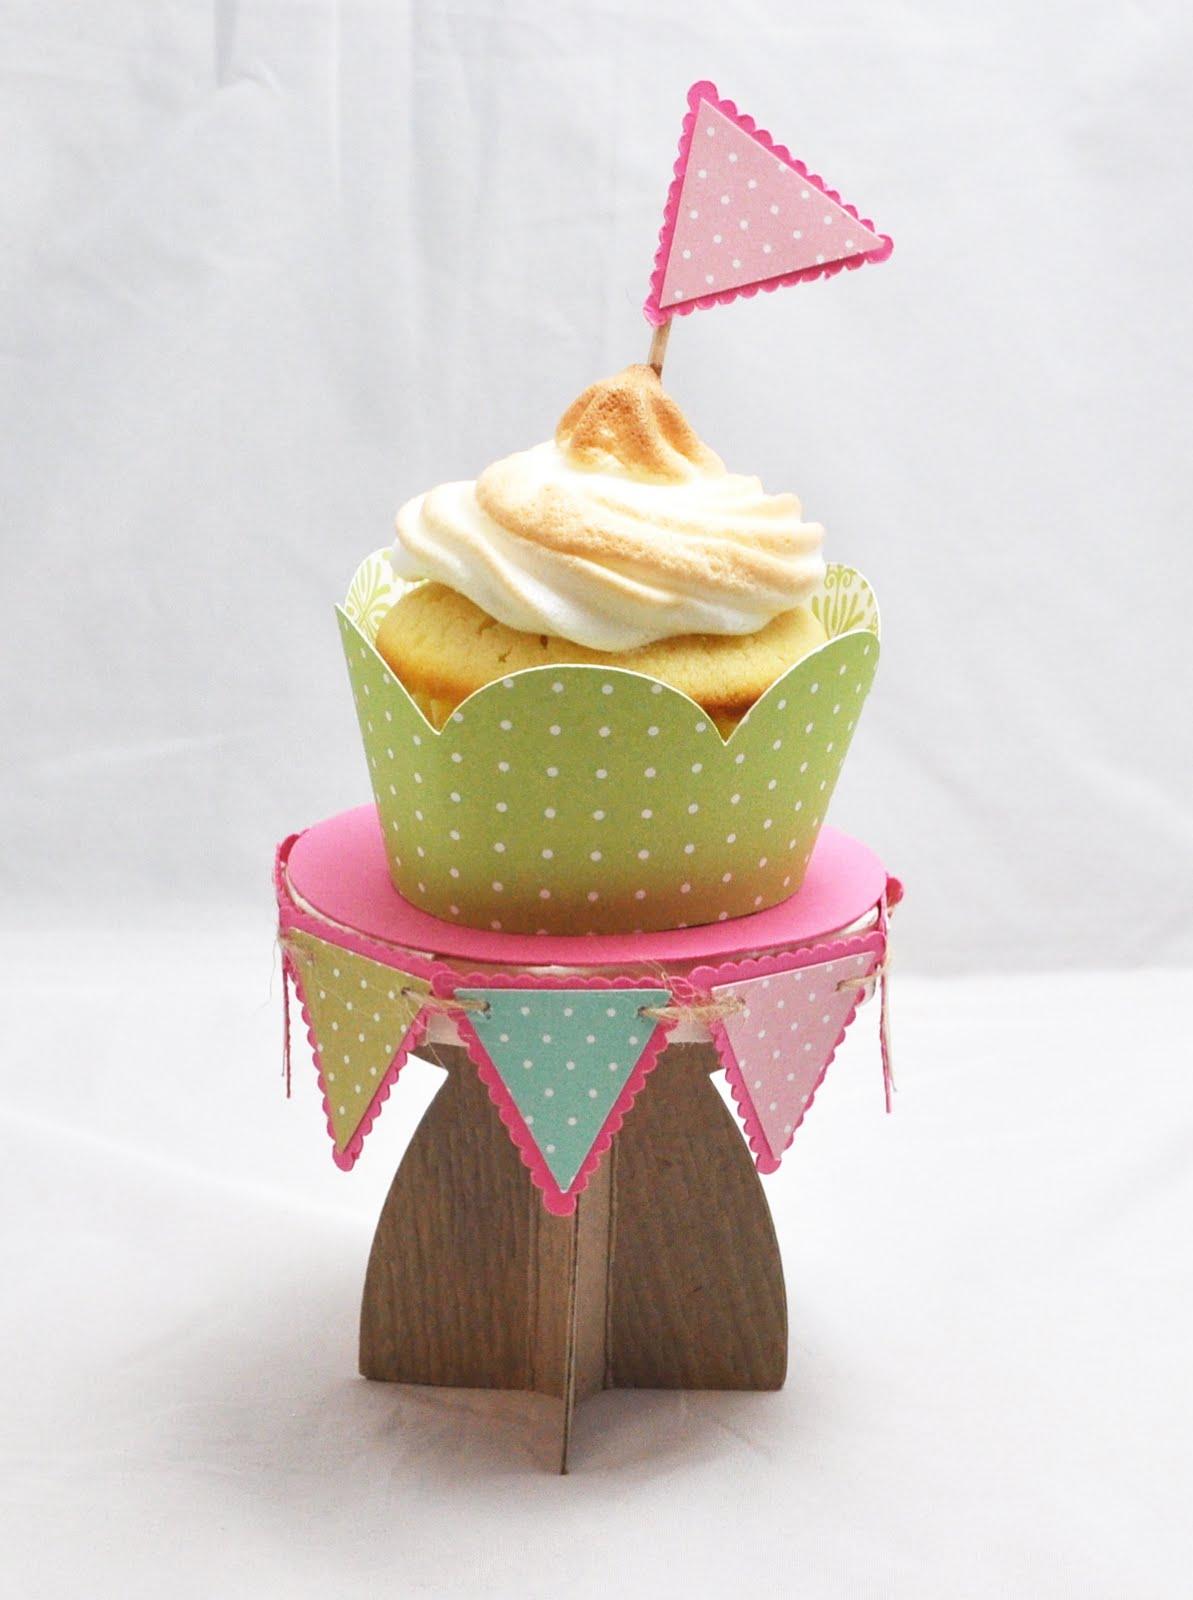 Life With Terri: Cupcake Sunday